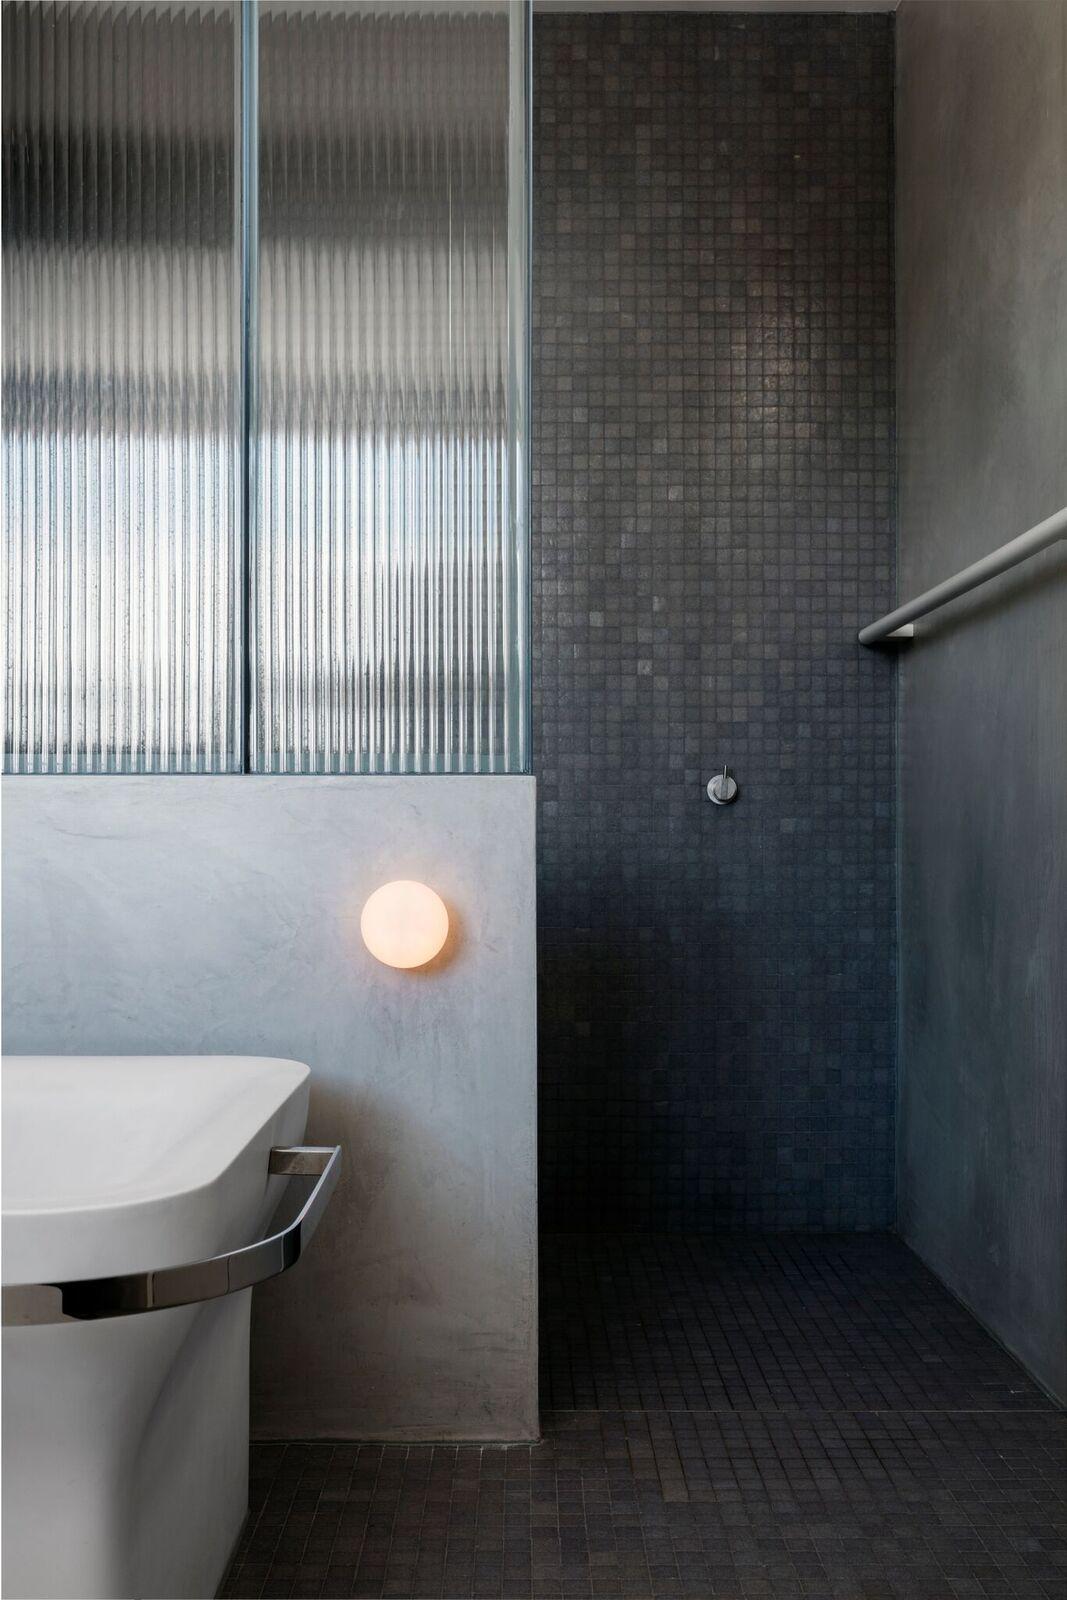 Vixel tiles flos wall light and novecento bath at darlinghurst